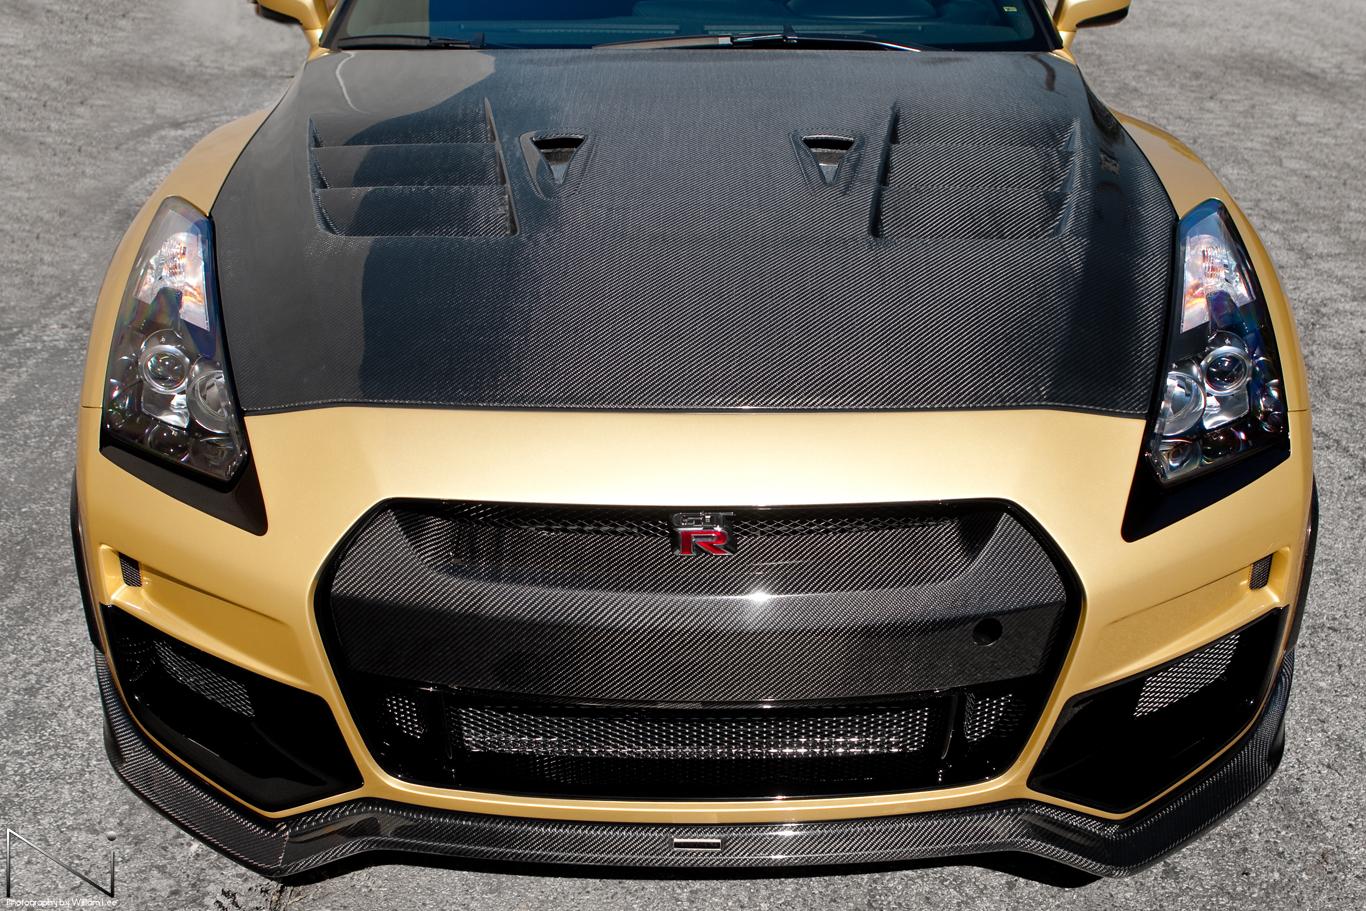 TommyKaira GT-R R35 Top Front